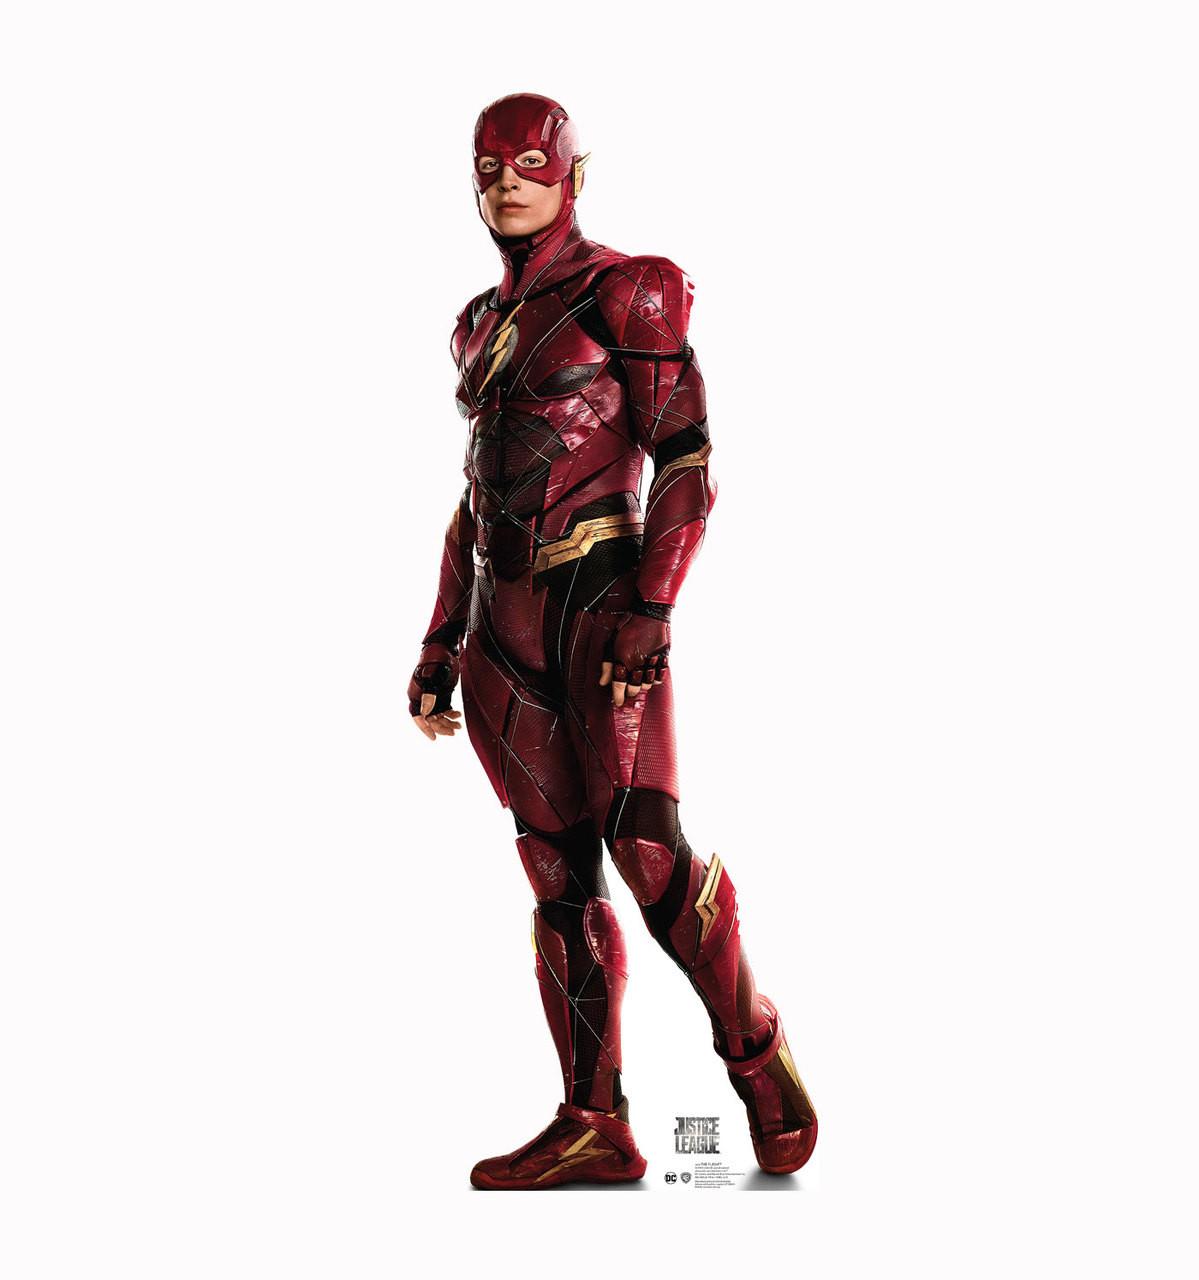 The Flash (Justice League) Cardboard Standup Cutout 1